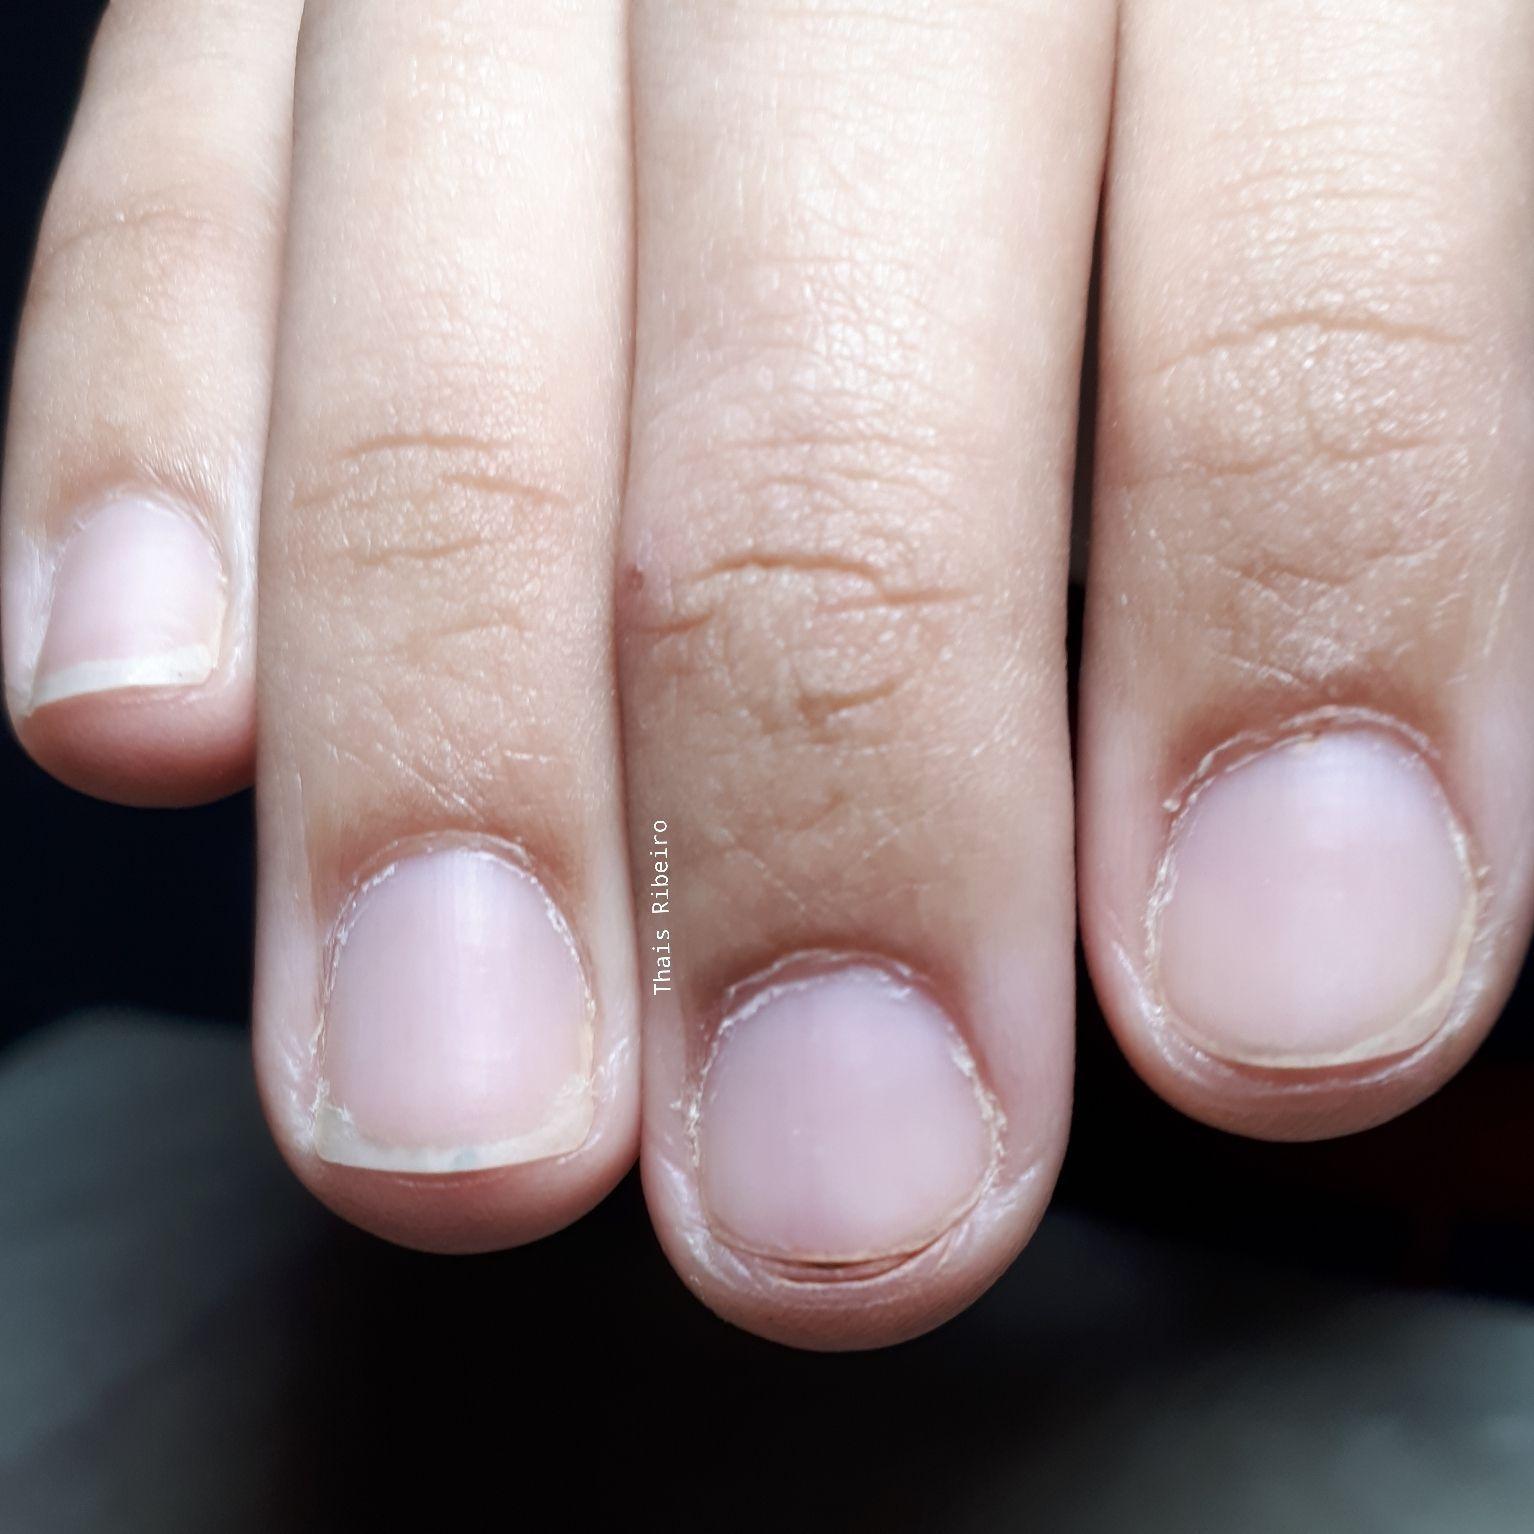 Antes unha manicure e pedicure